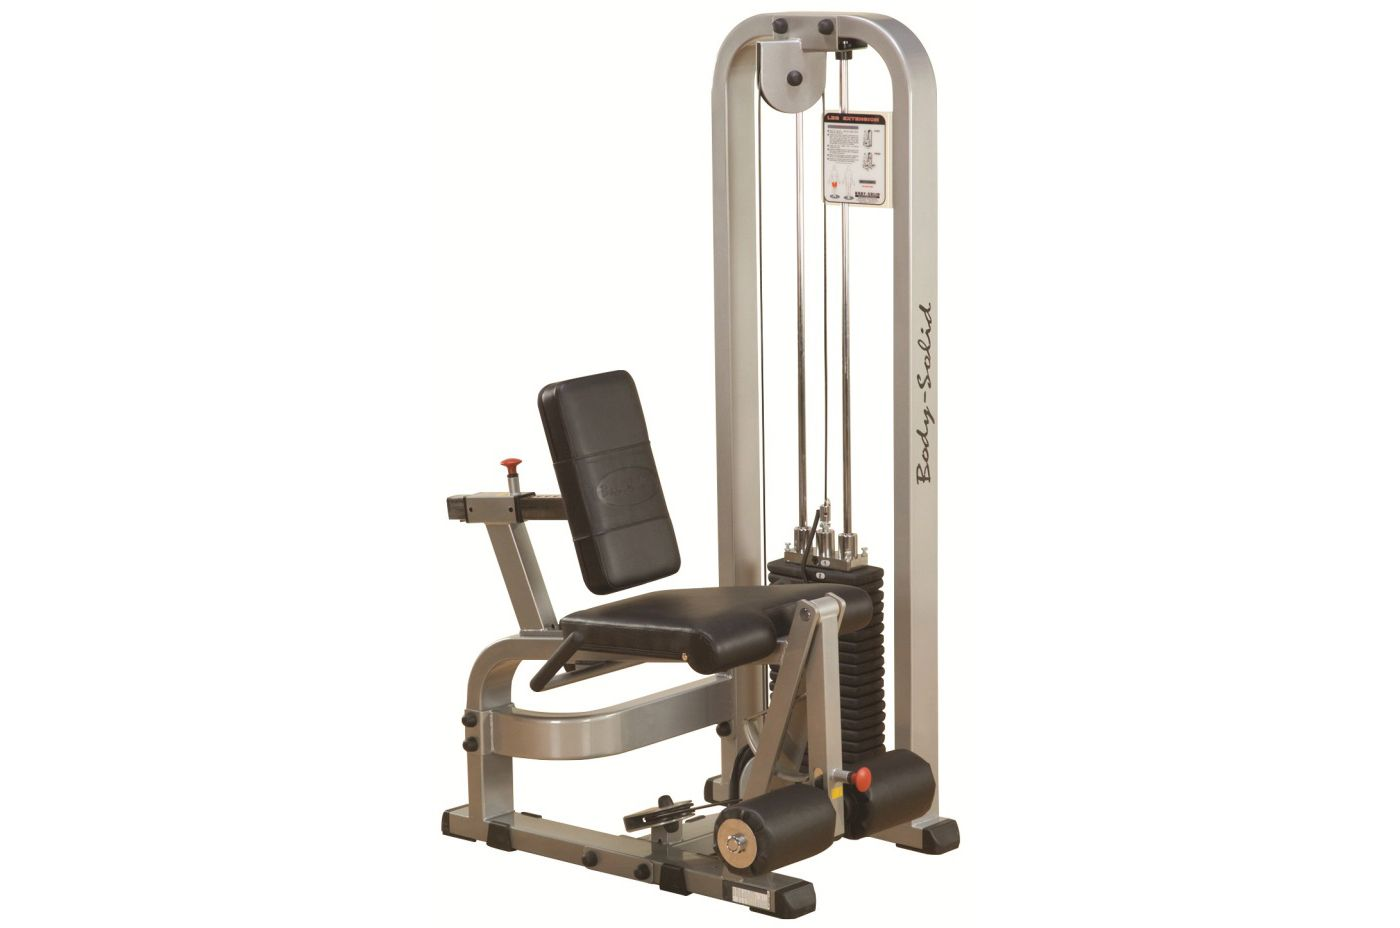 Body Solid Pro Clubline SLE200G/2 Leg Extension Machine